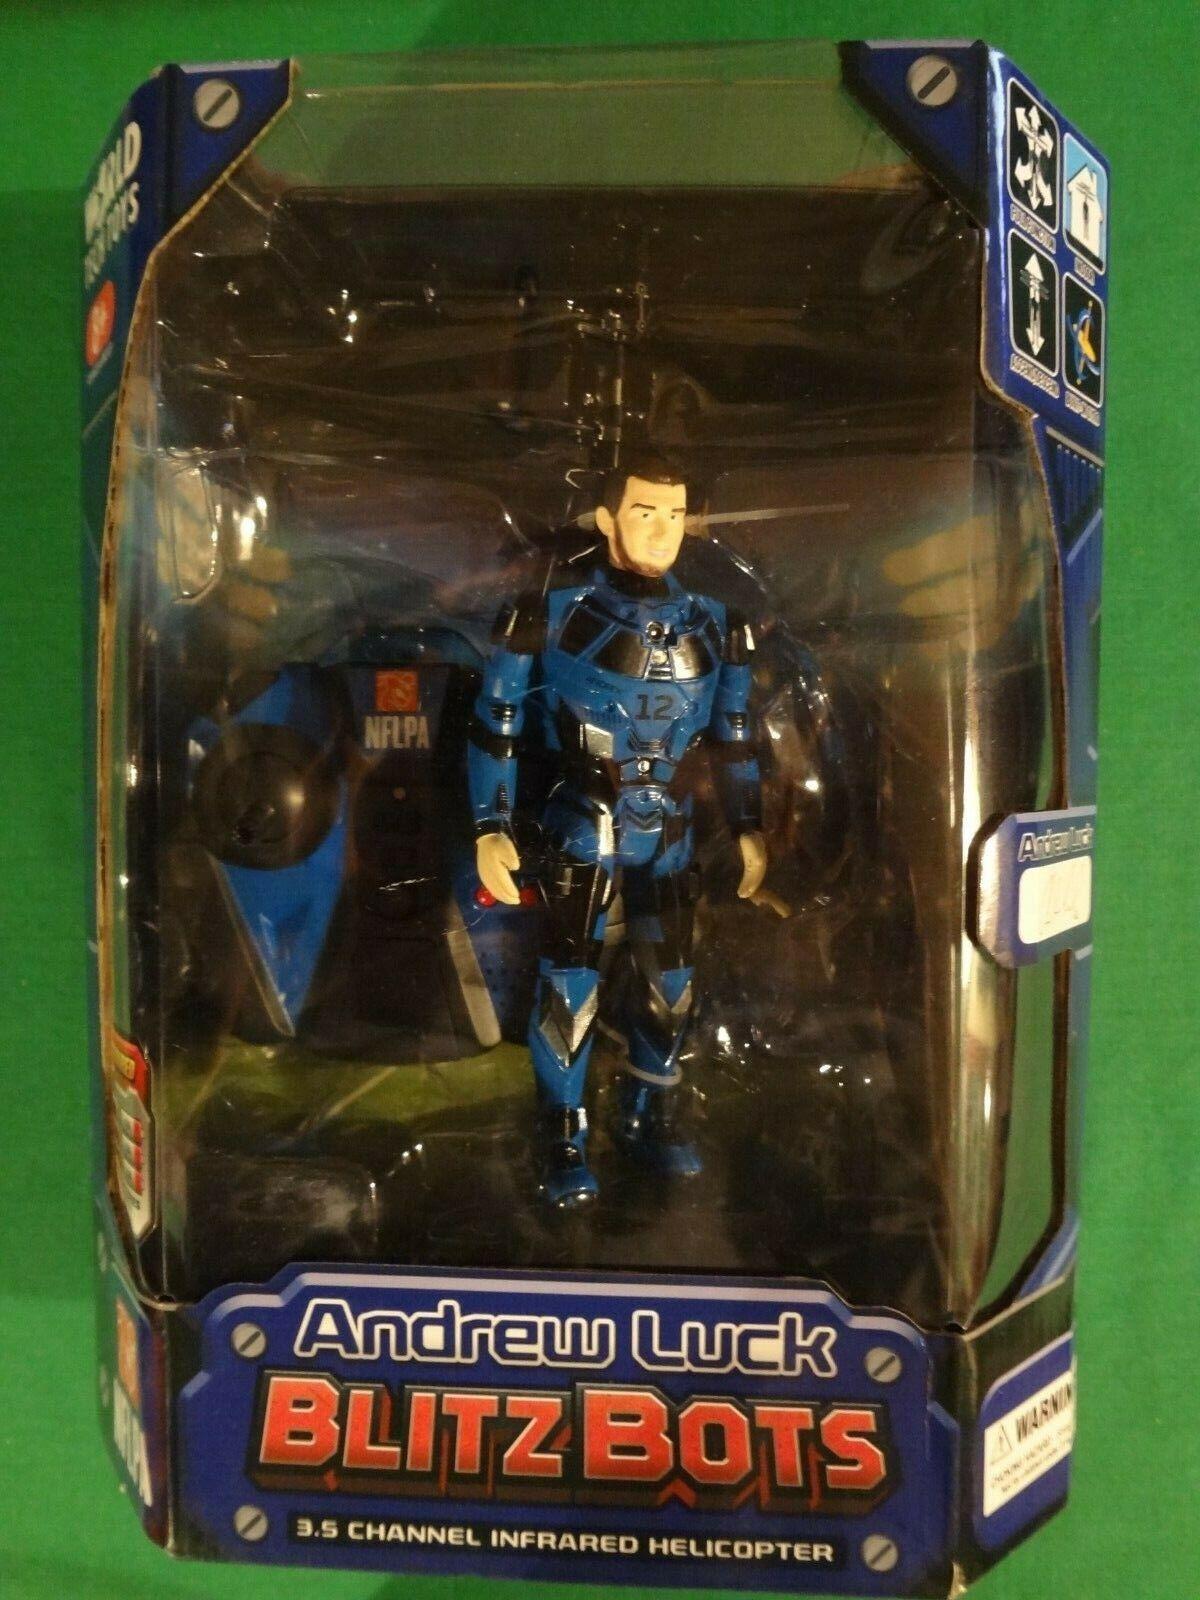 2015 World Tech Toys Andrew Luck Blitz bots Drone